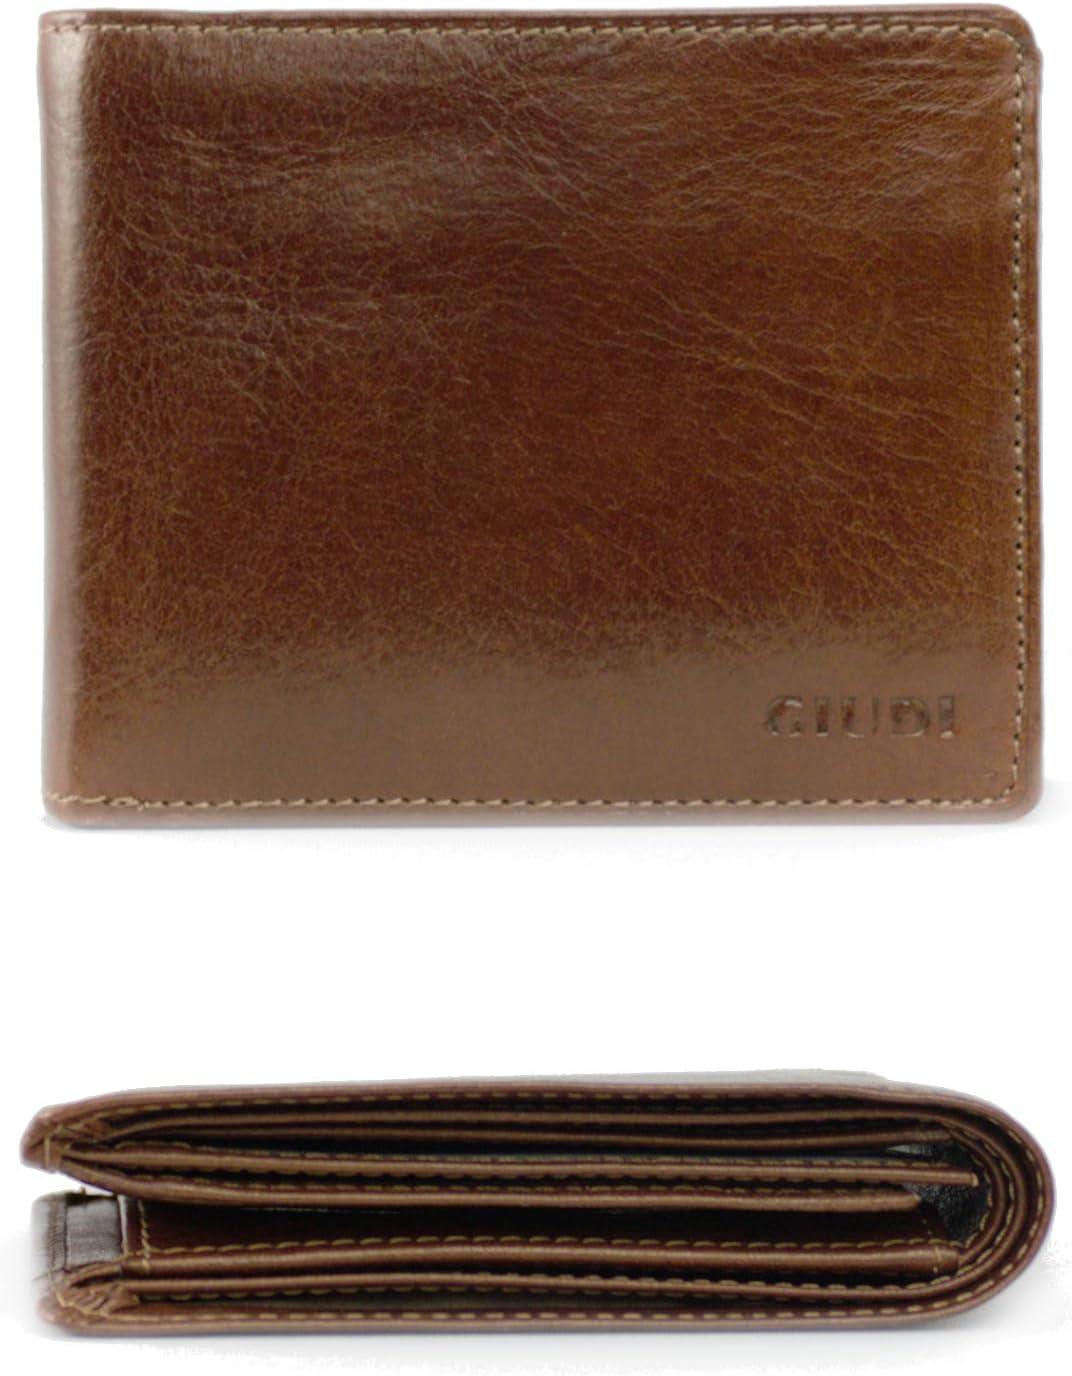 GIUDI Men`s 割引も実施中 Wallet Slim 定番キャンバス Brown Leather